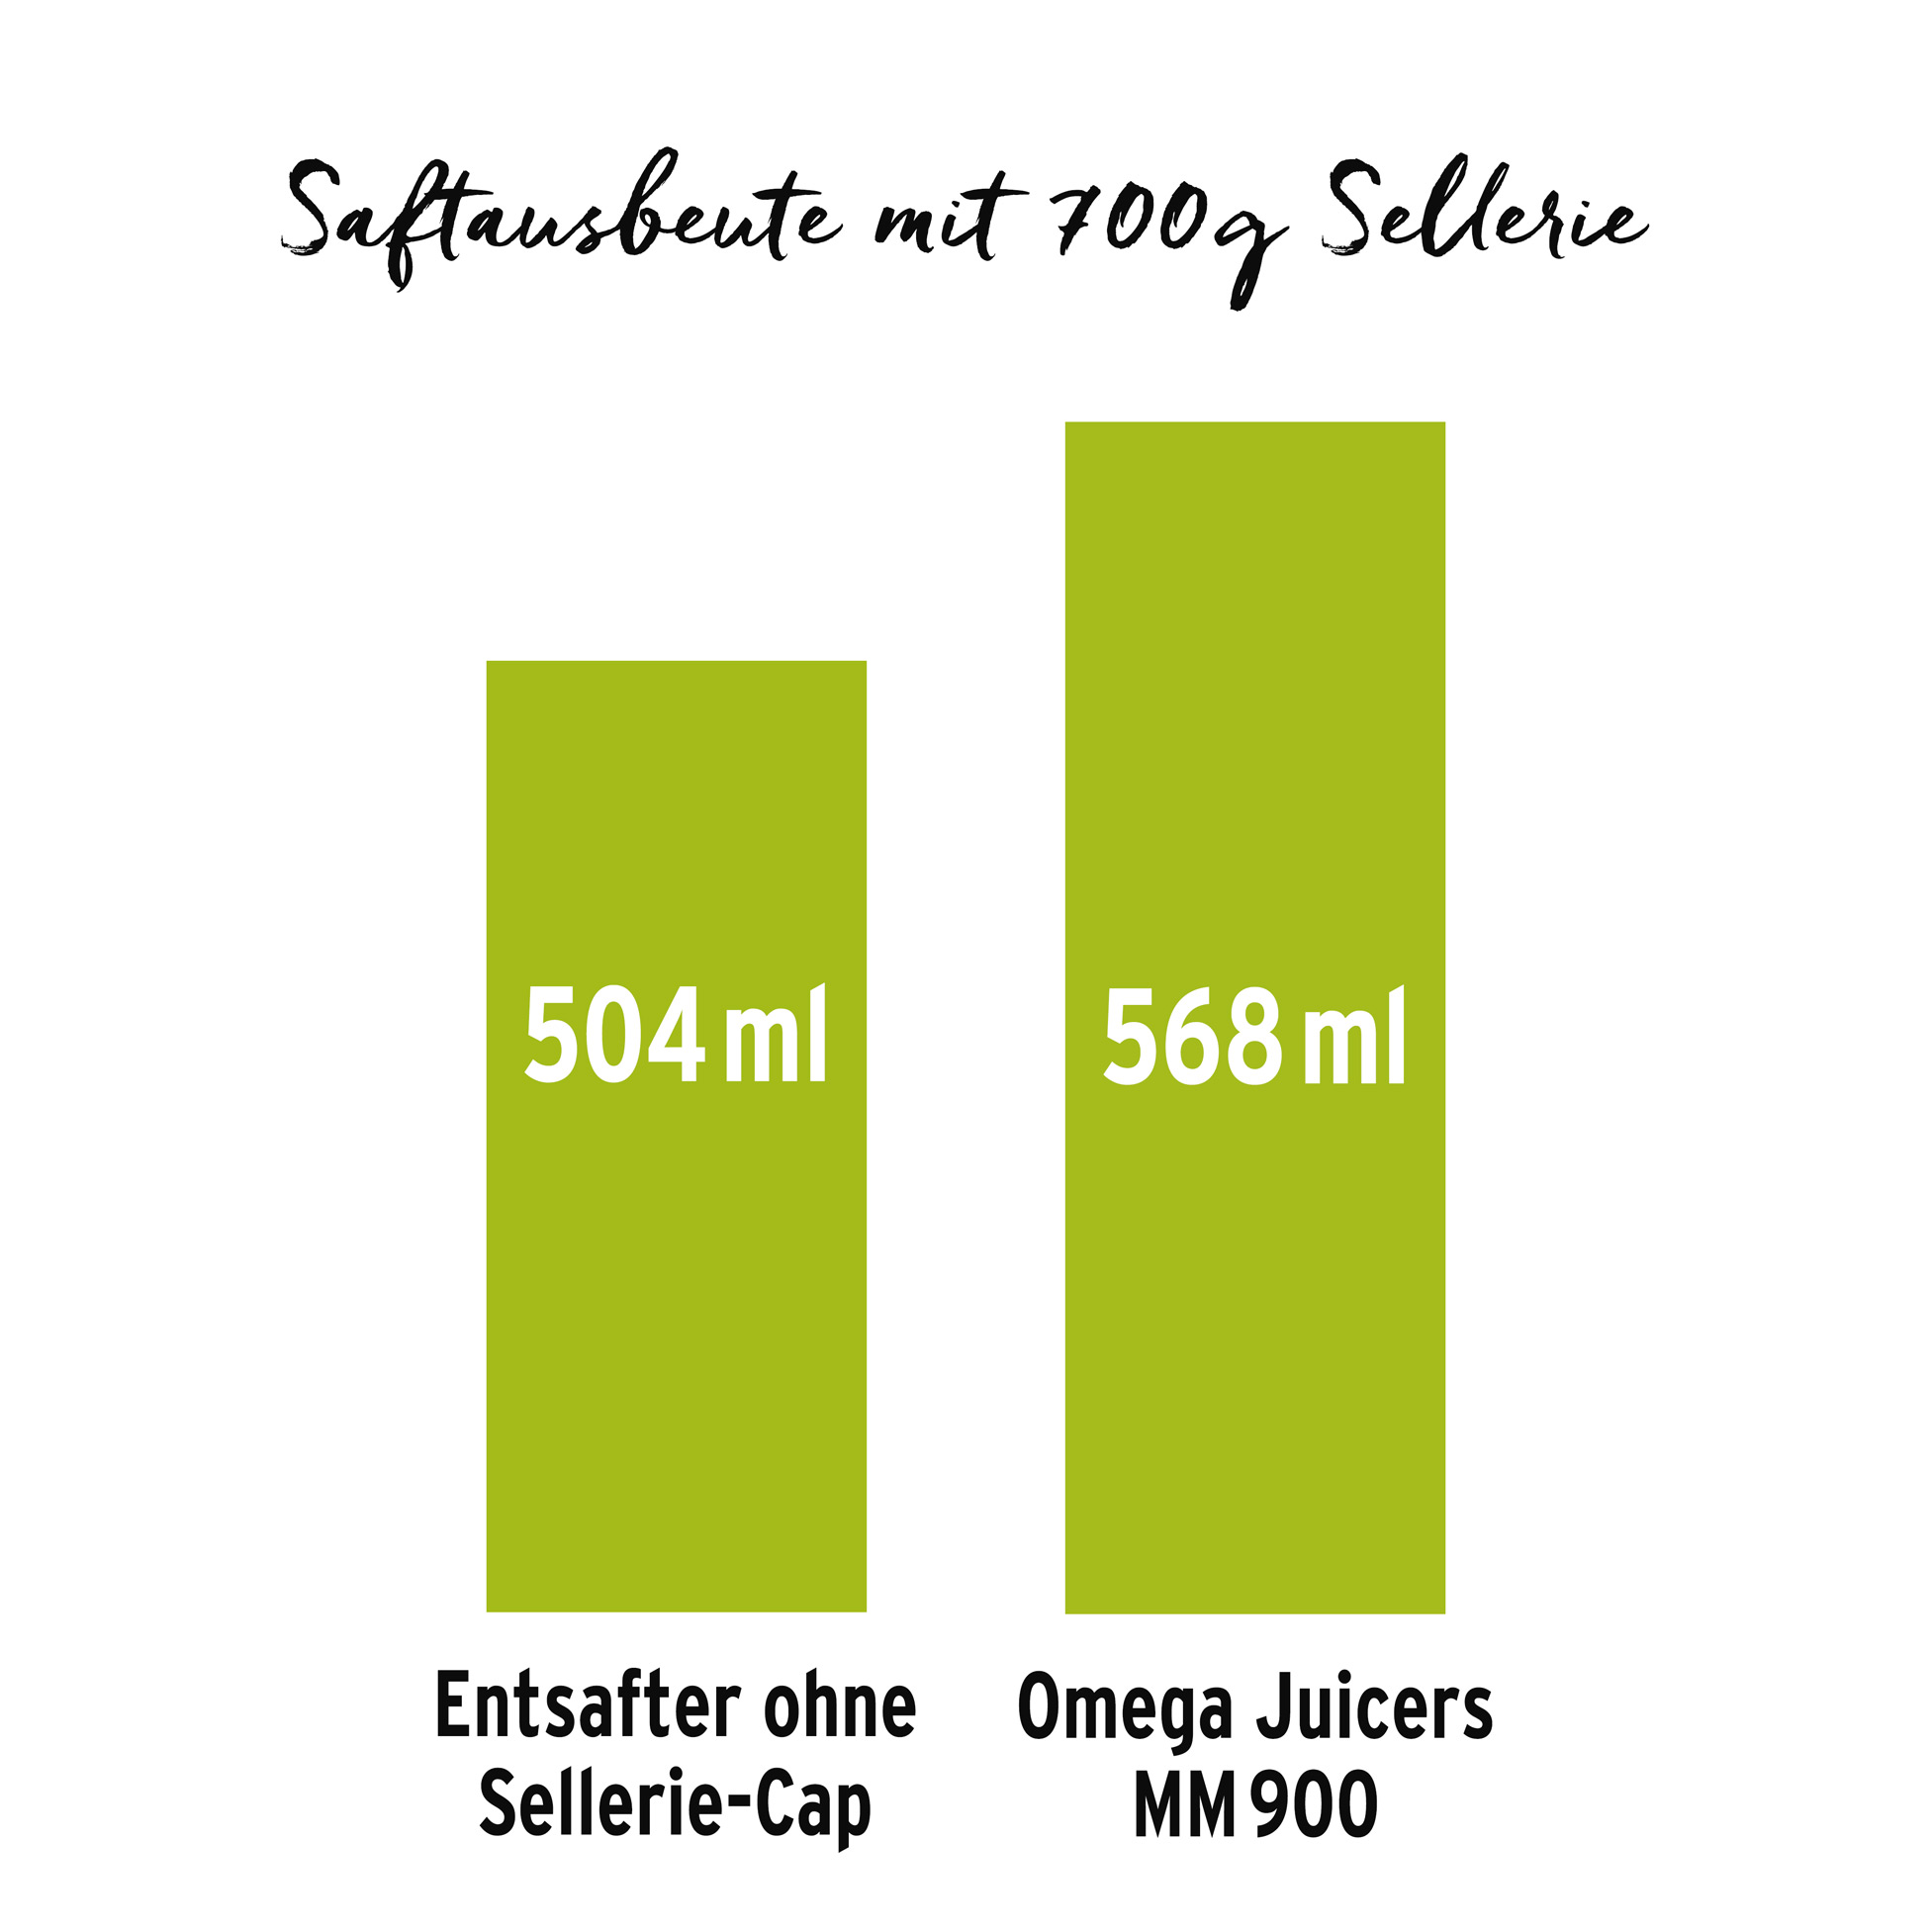 Omega Juicers Selleriesaft Vergleich